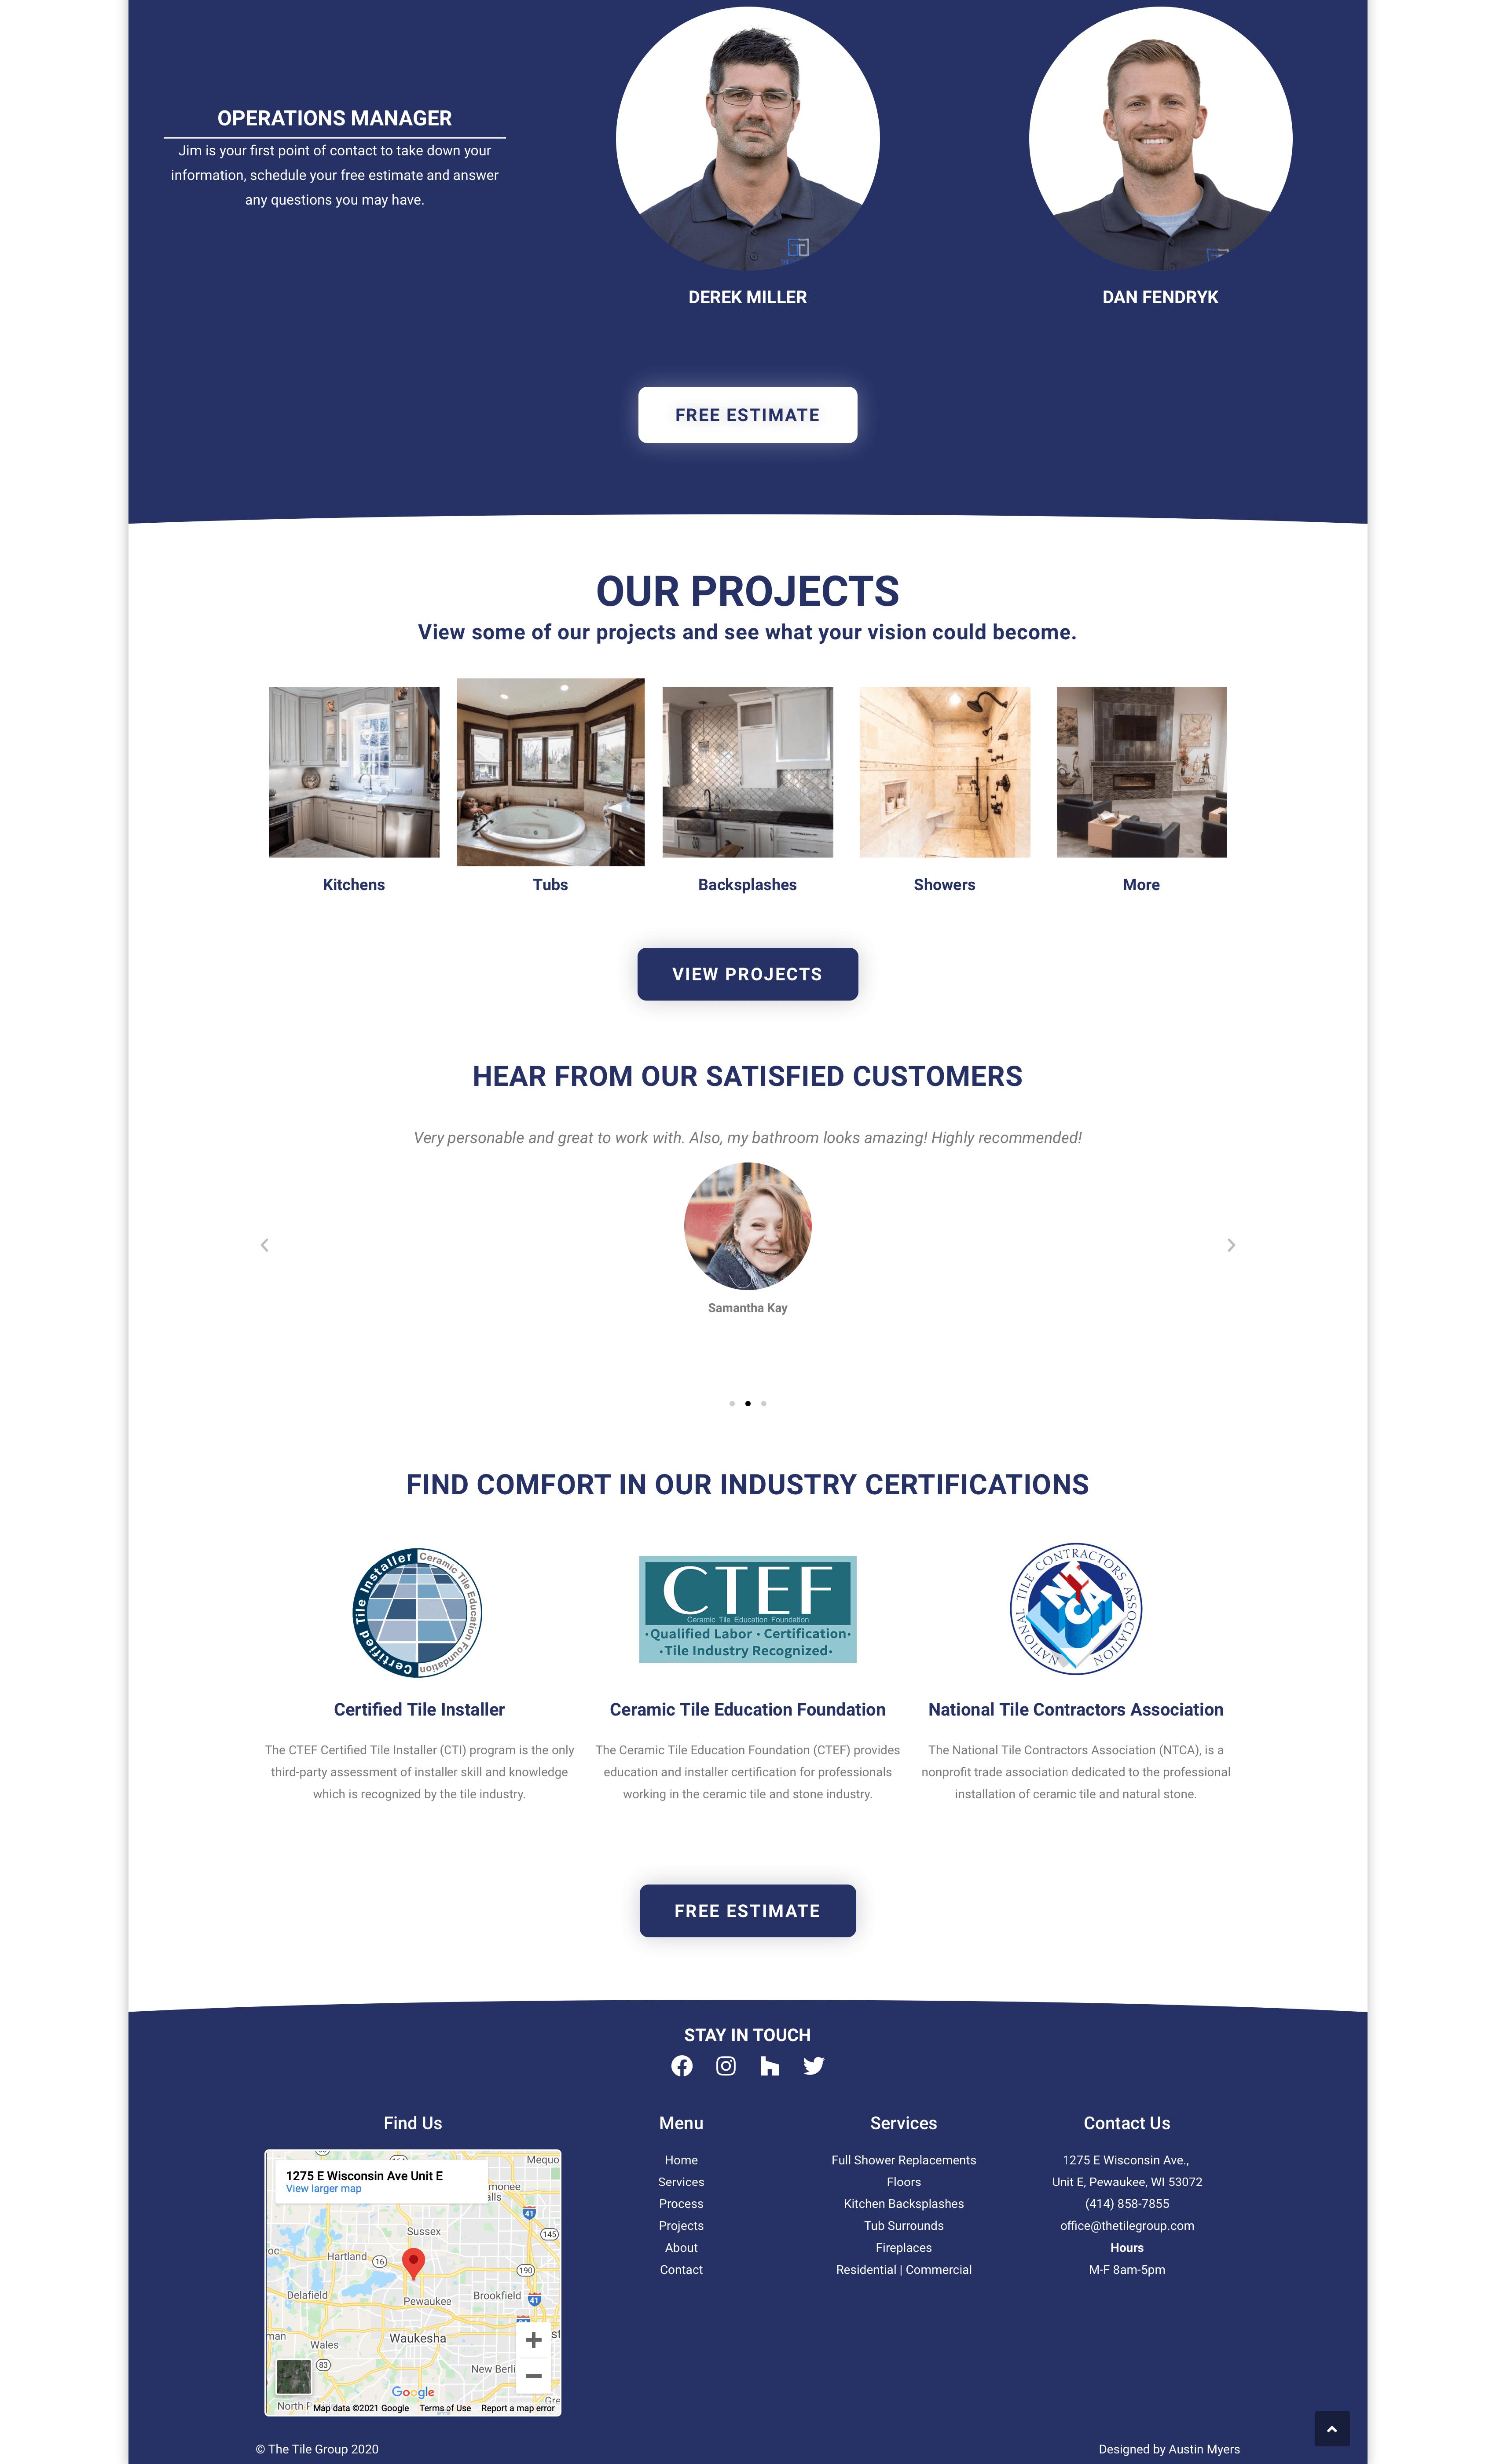 Old version of website for comparison image 1 of 2